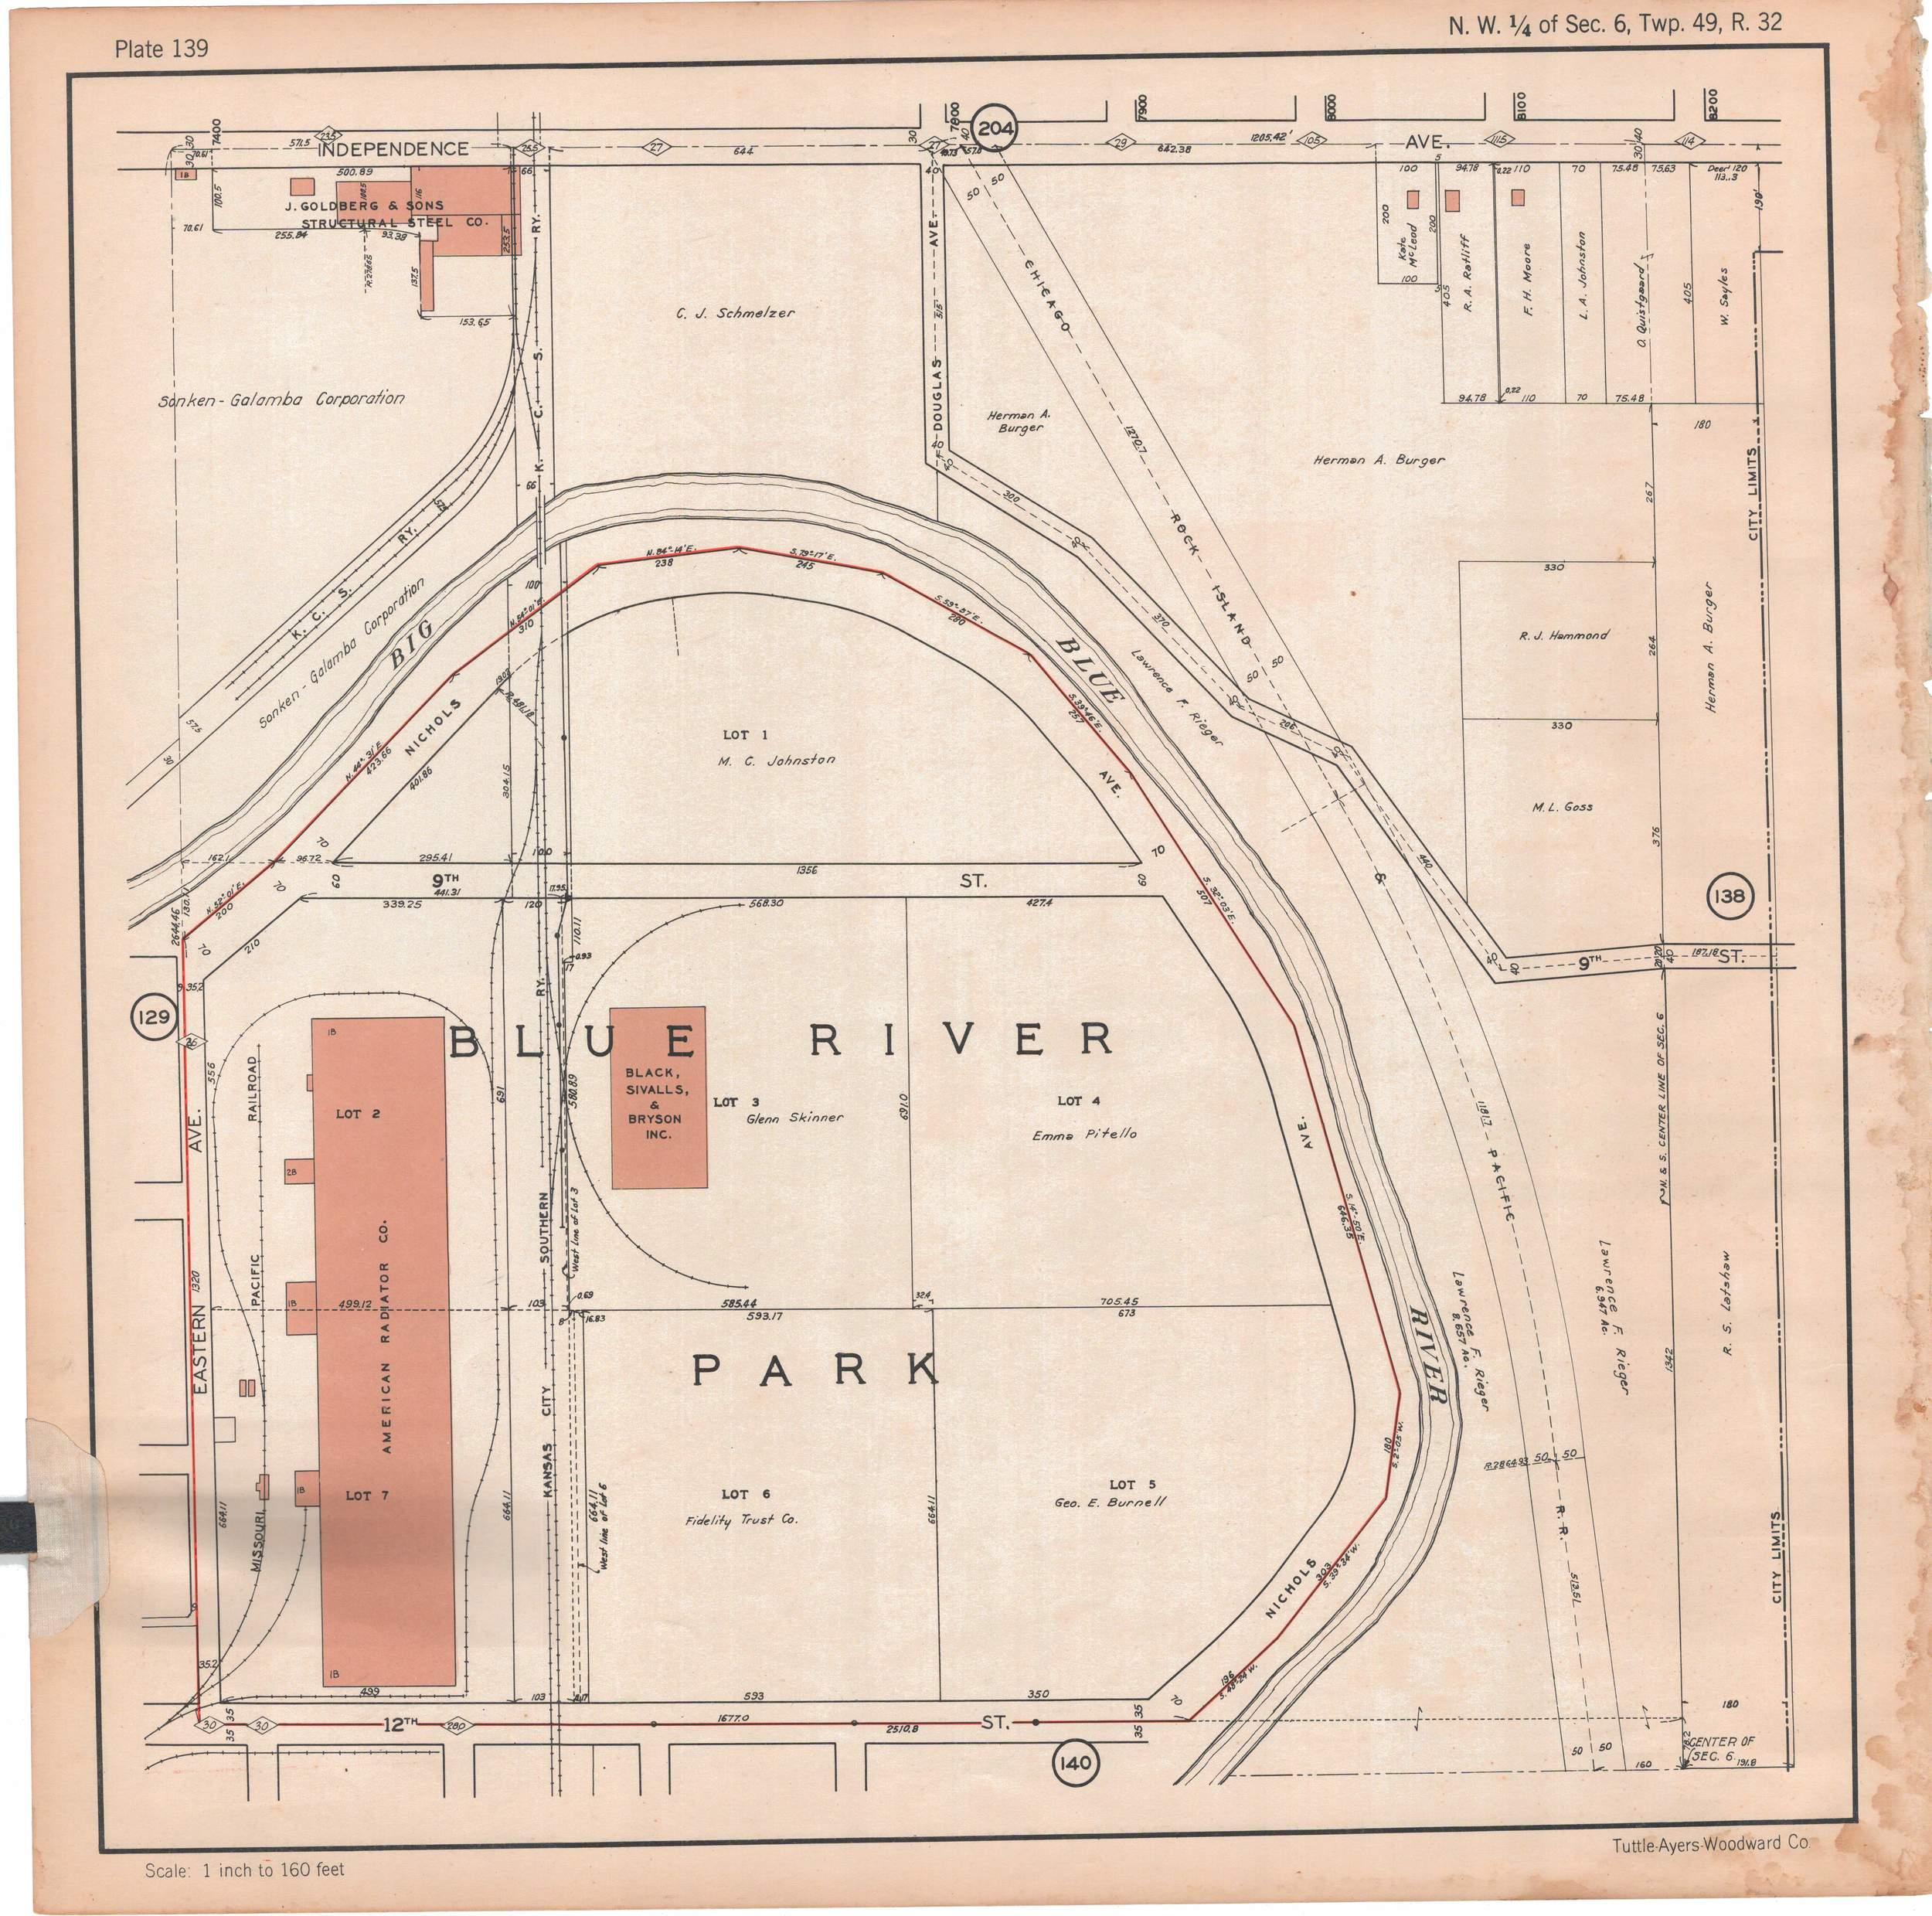 1925 TUTTLE_AYERS_Plate_139.JPG